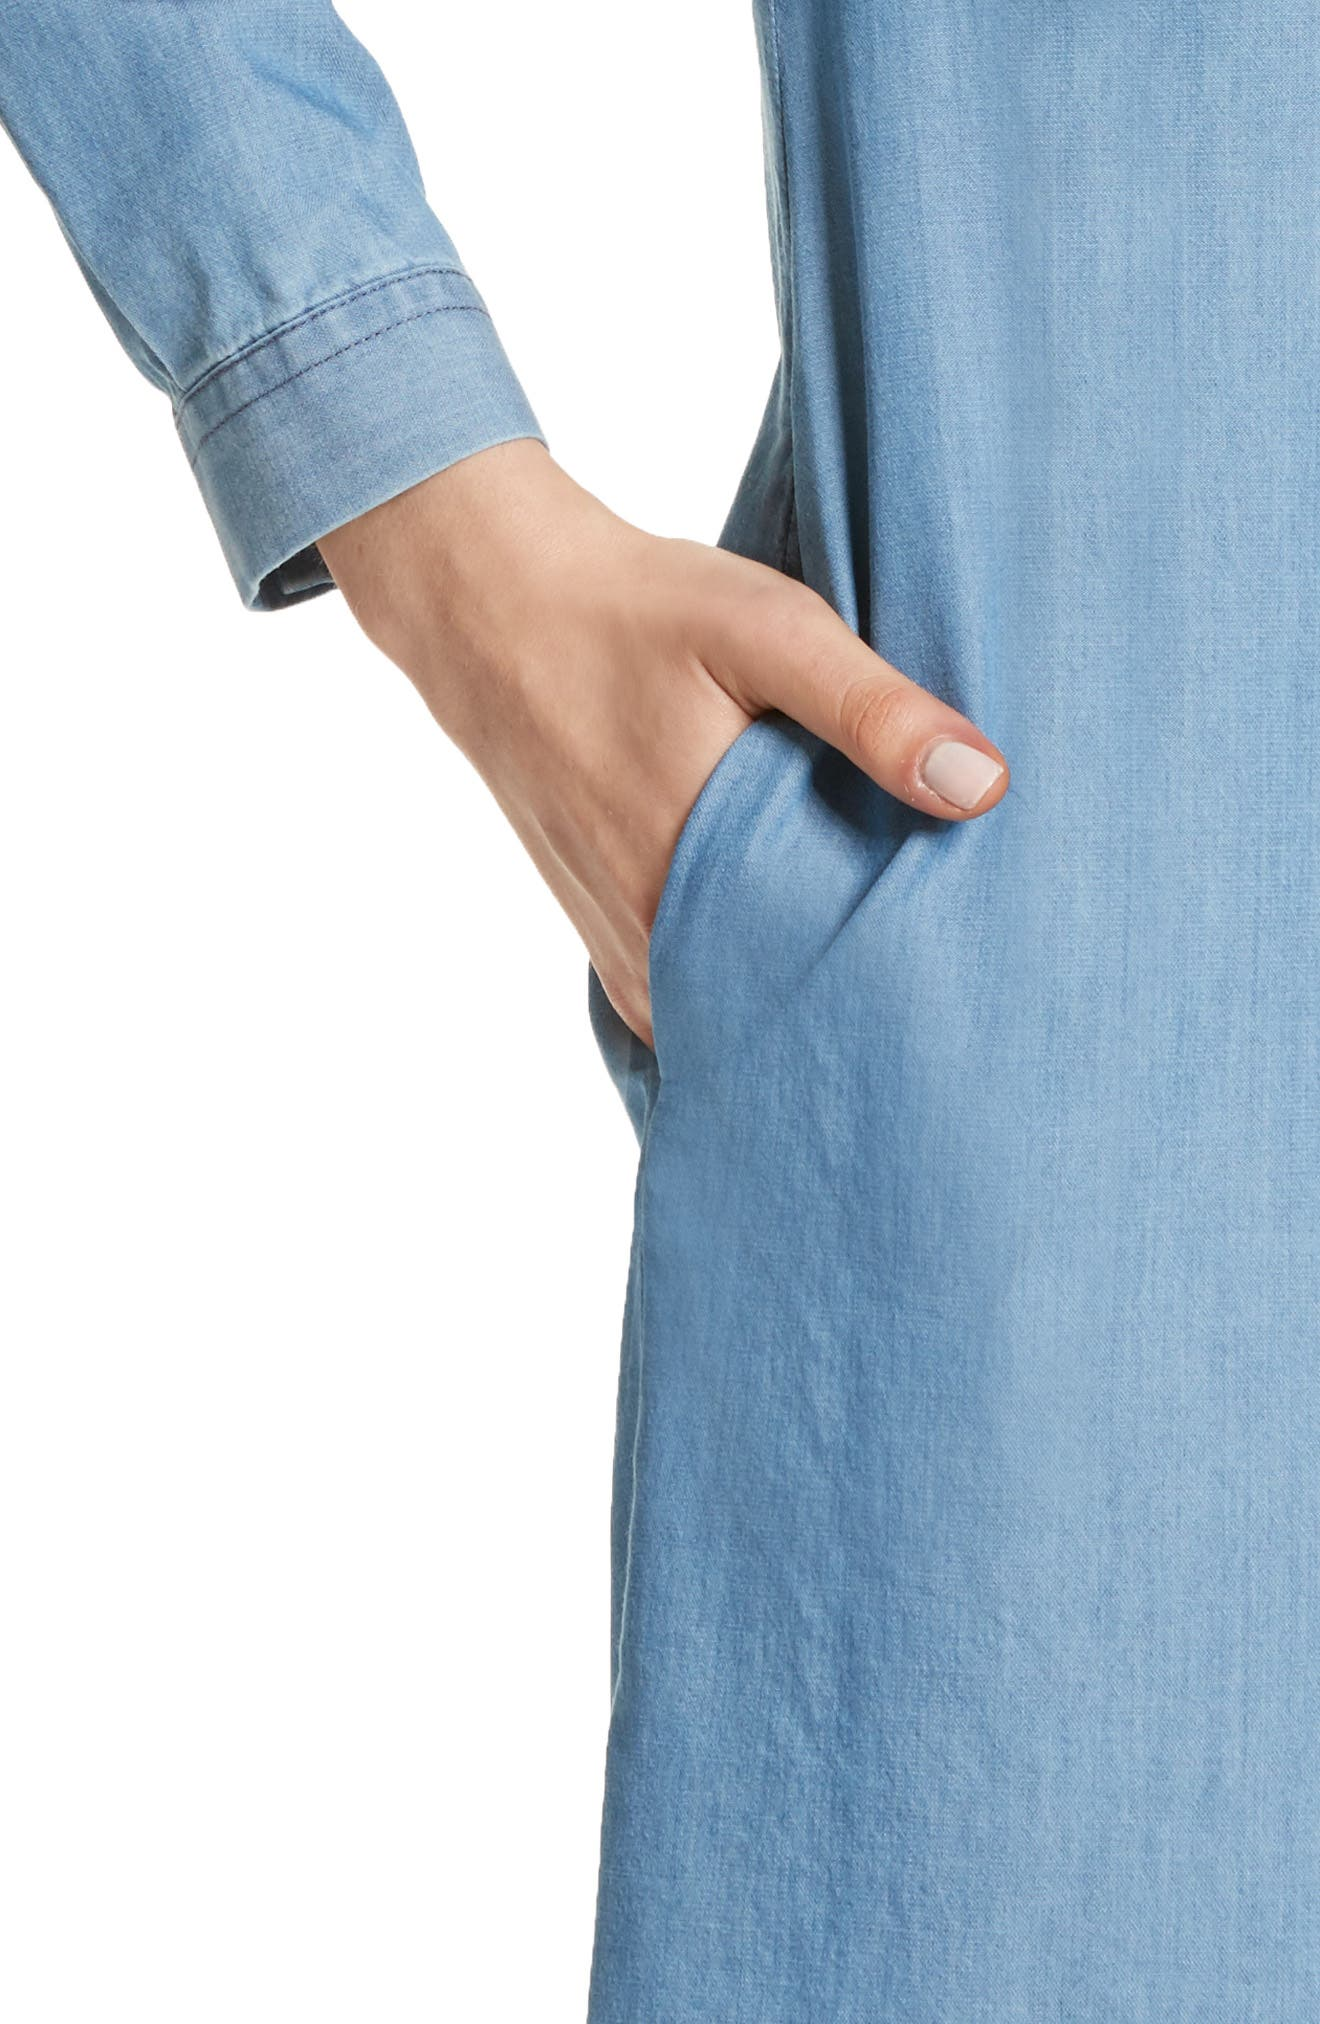 Cotton & Cashmere Chambray Shirtdress,                             Alternate thumbnail 4, color,                             400